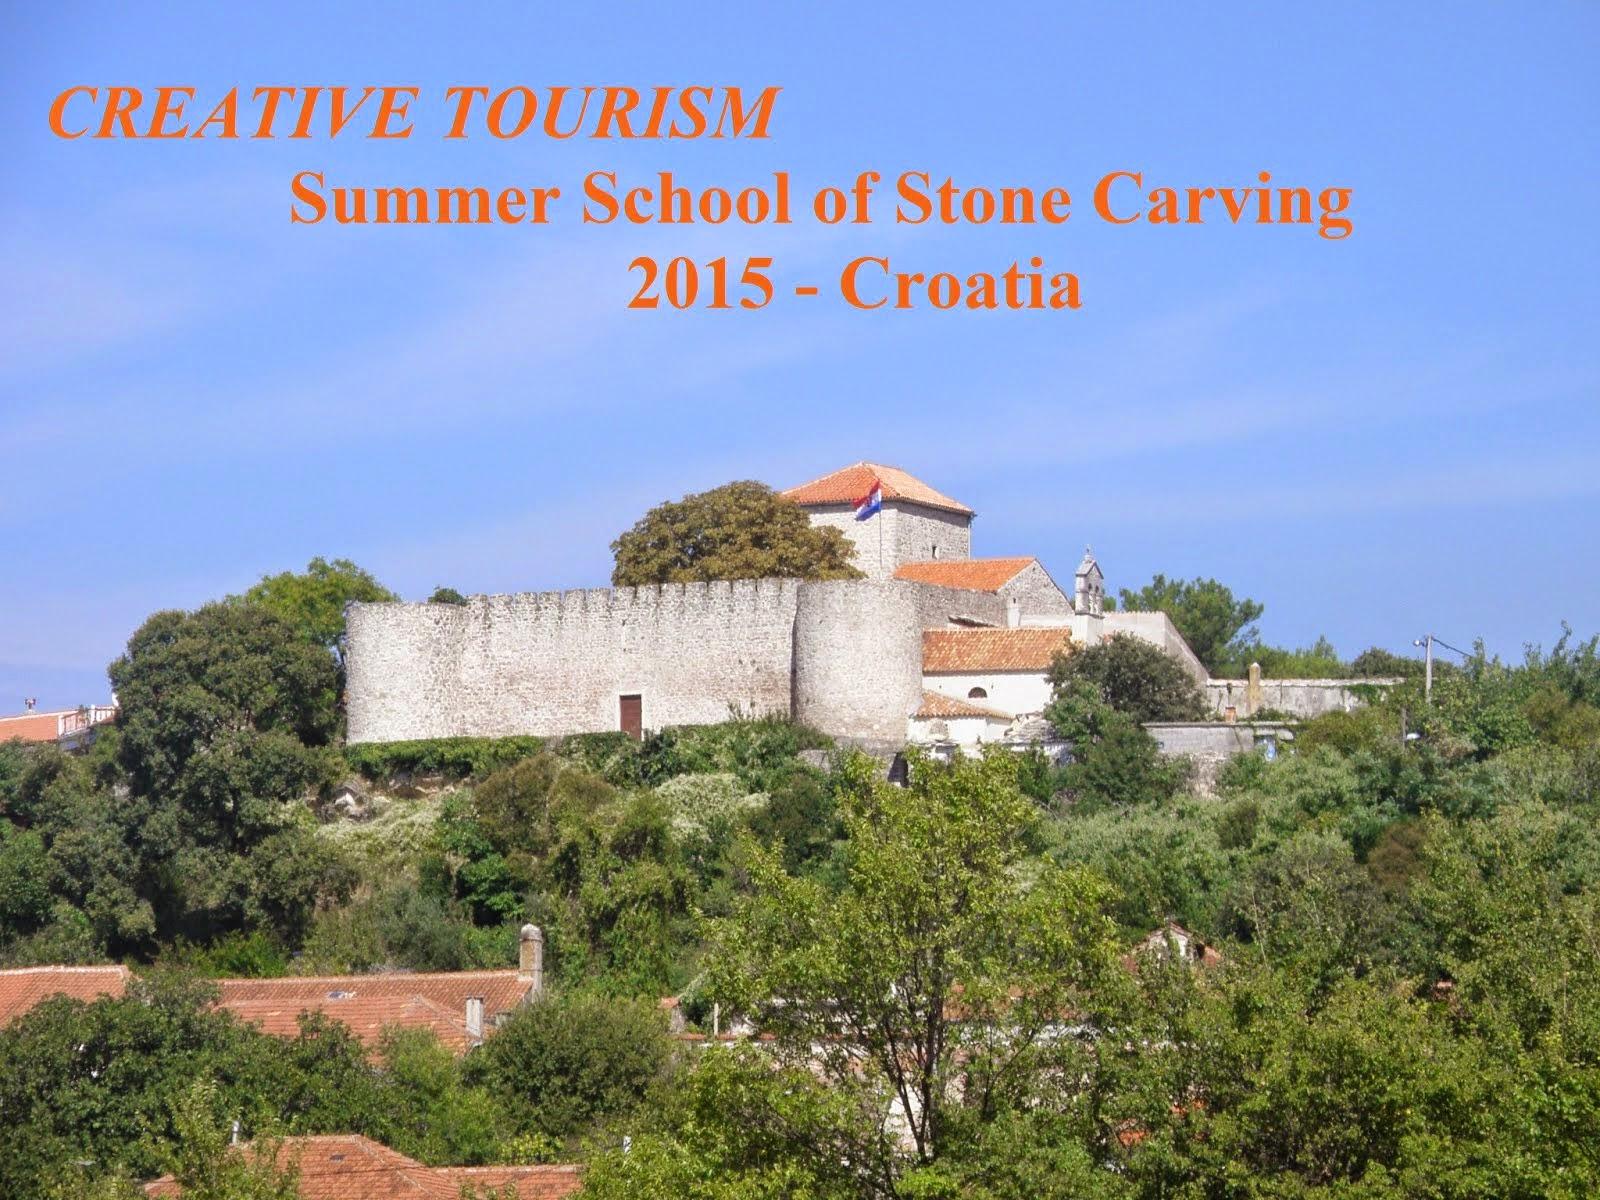 CREATIVE TOURISM / Summer School of Stone Carving - Croatia